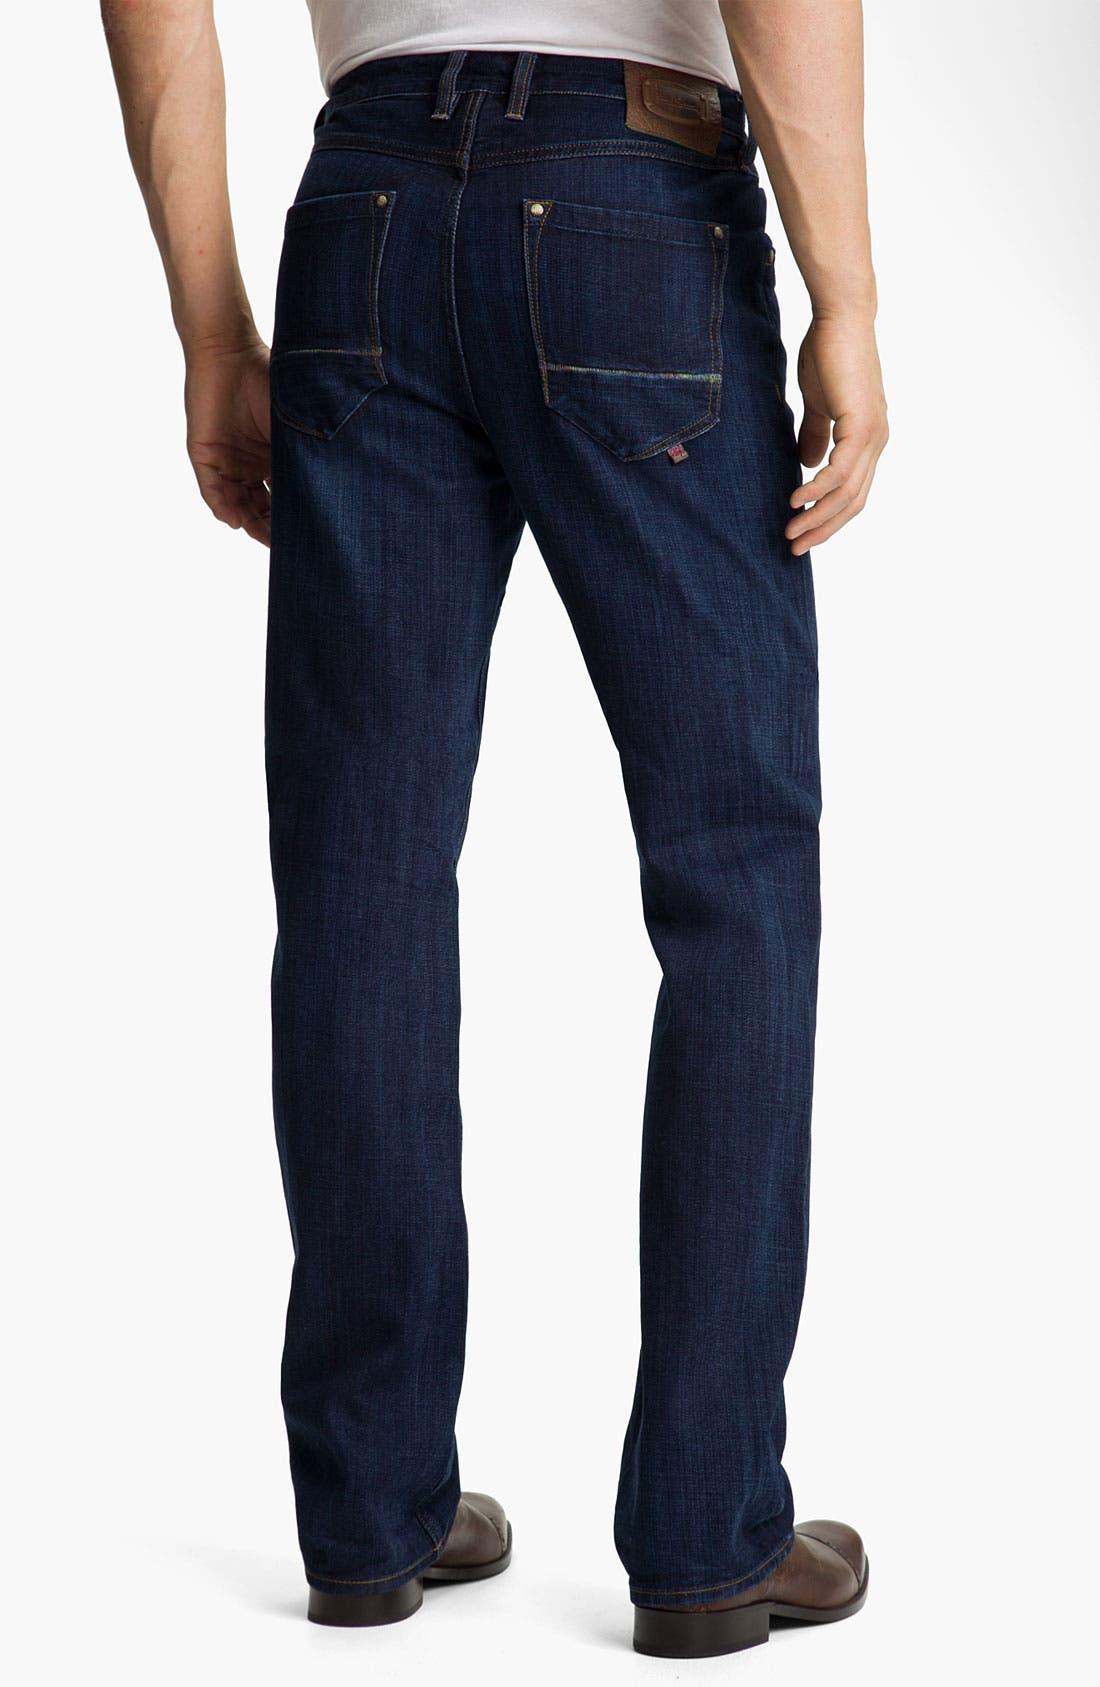 Alternate Image 2  - Robert Graham Jeans 'Simply Blue' Straight Leg Jeans (Indigo)